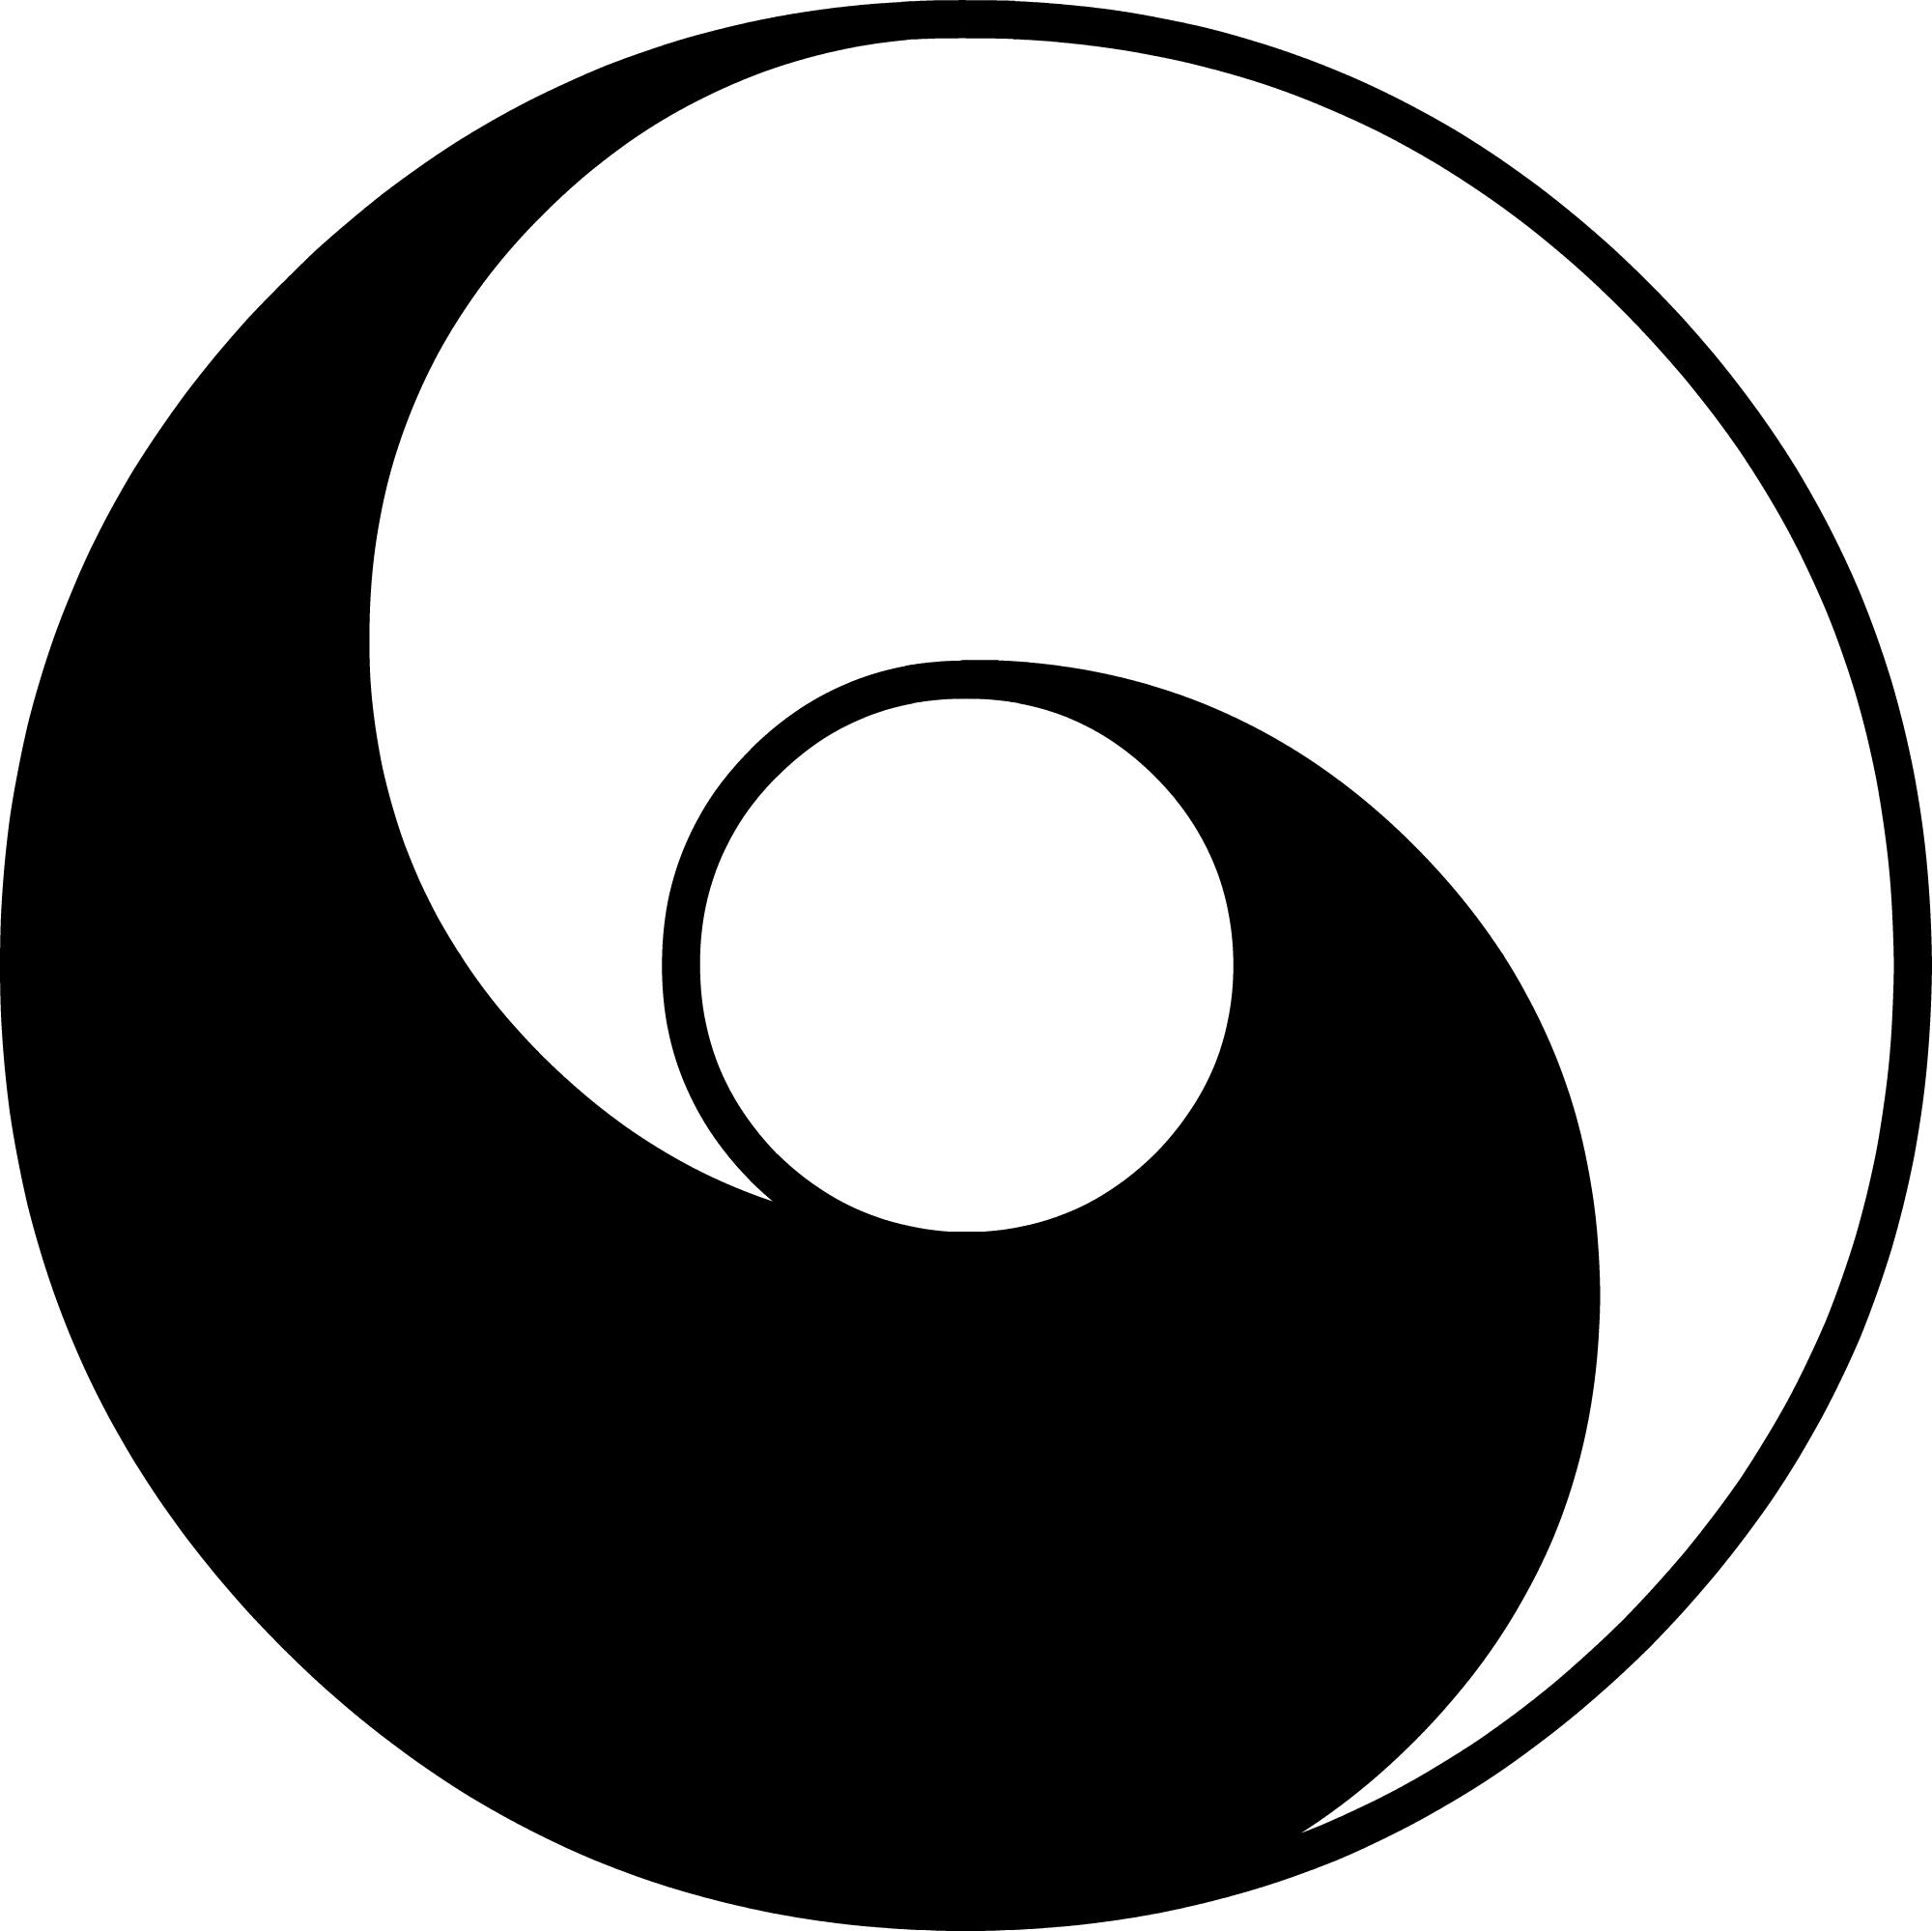 Ancient Symbol Of Creativity